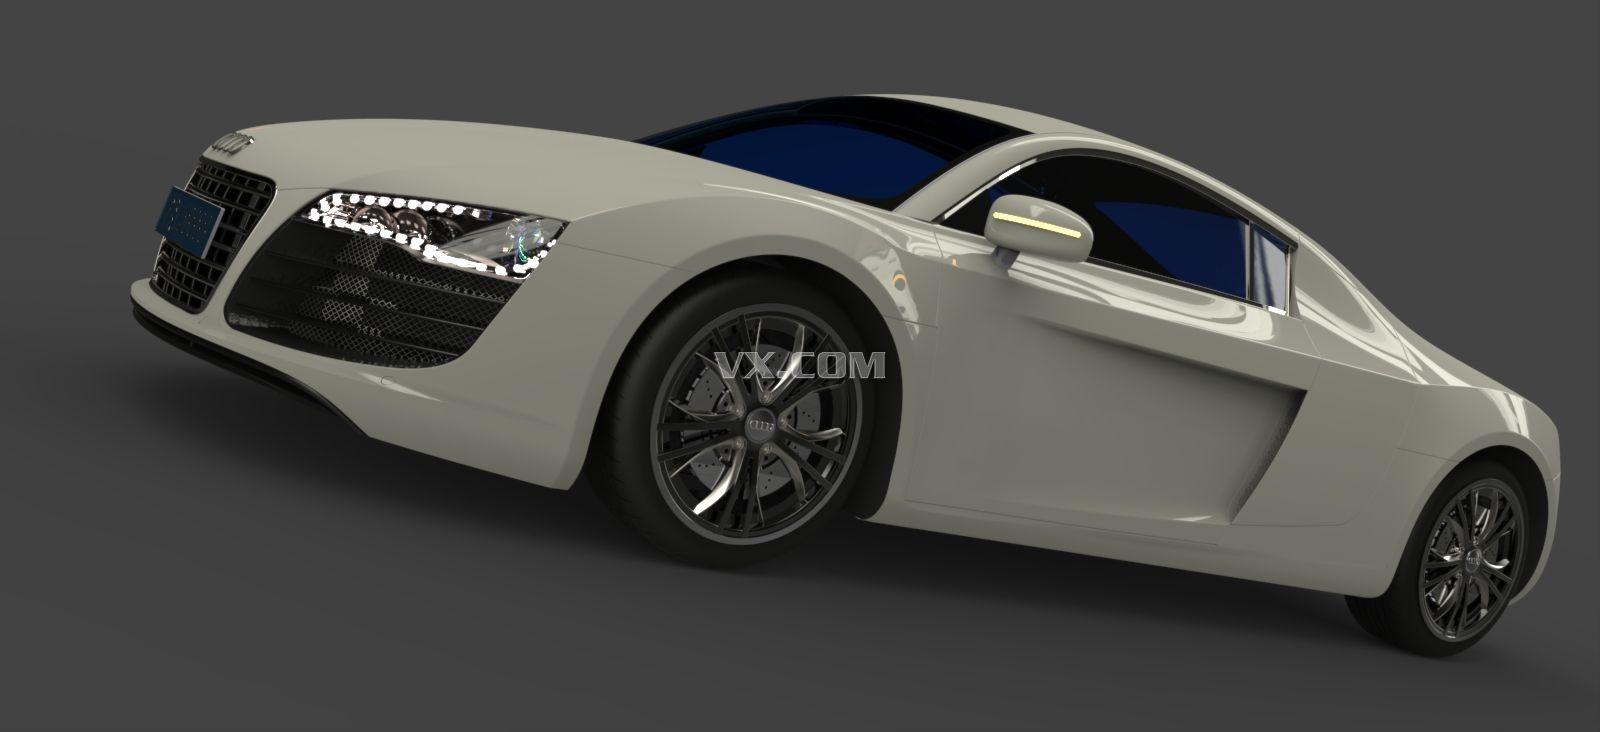 audi-r8-catia设计_catia_交通工具_3d模型_图纸下载